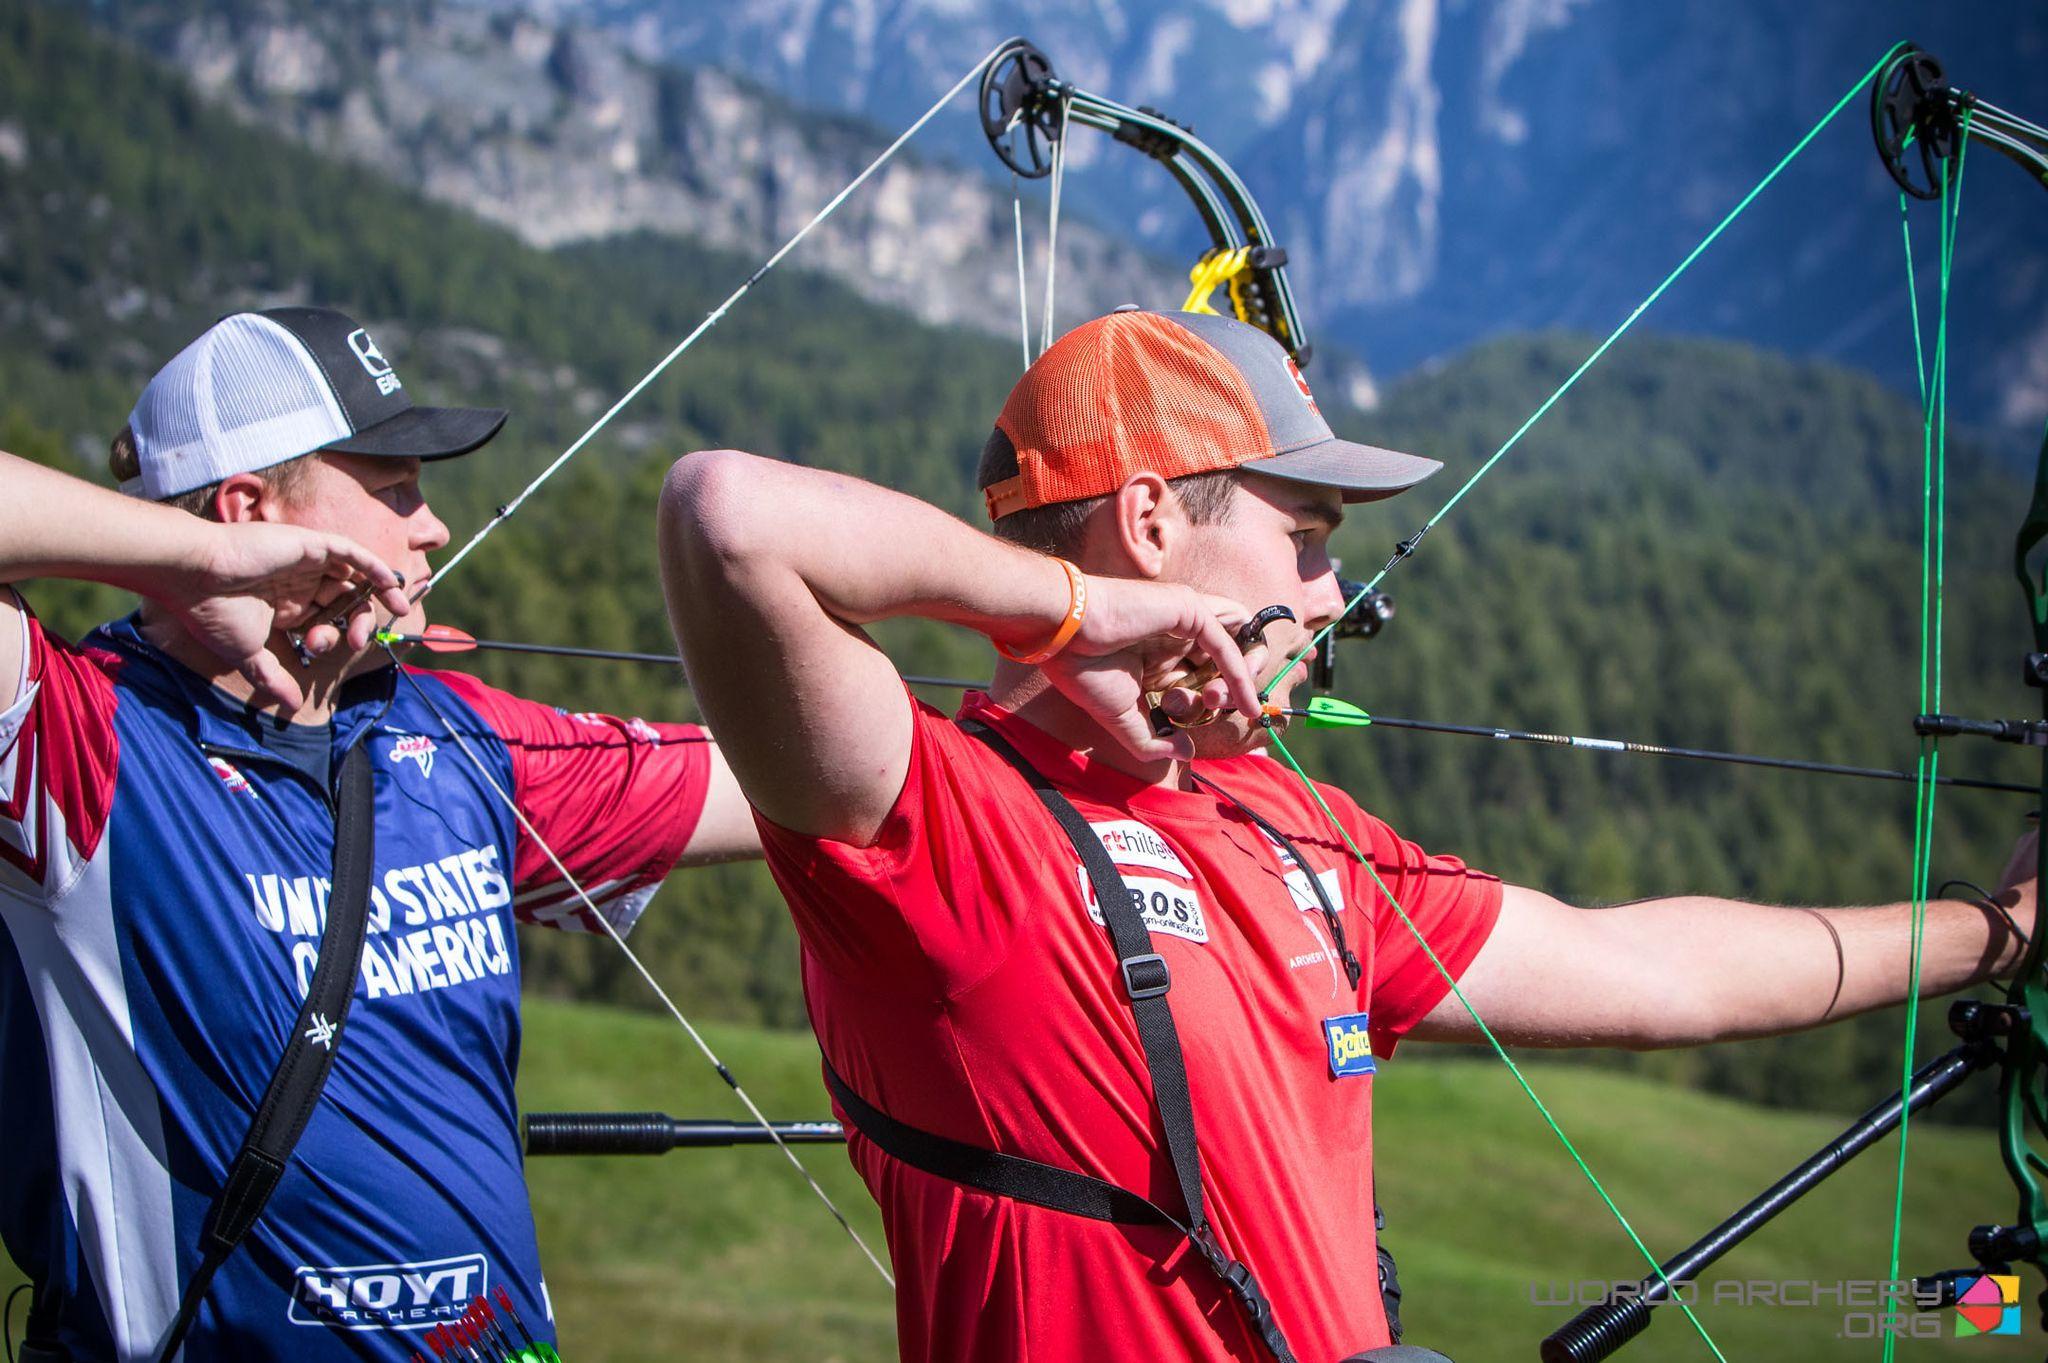 Nico Wiener will contest the men's compound final against Dutchman Mike Schloesser ©World Archery